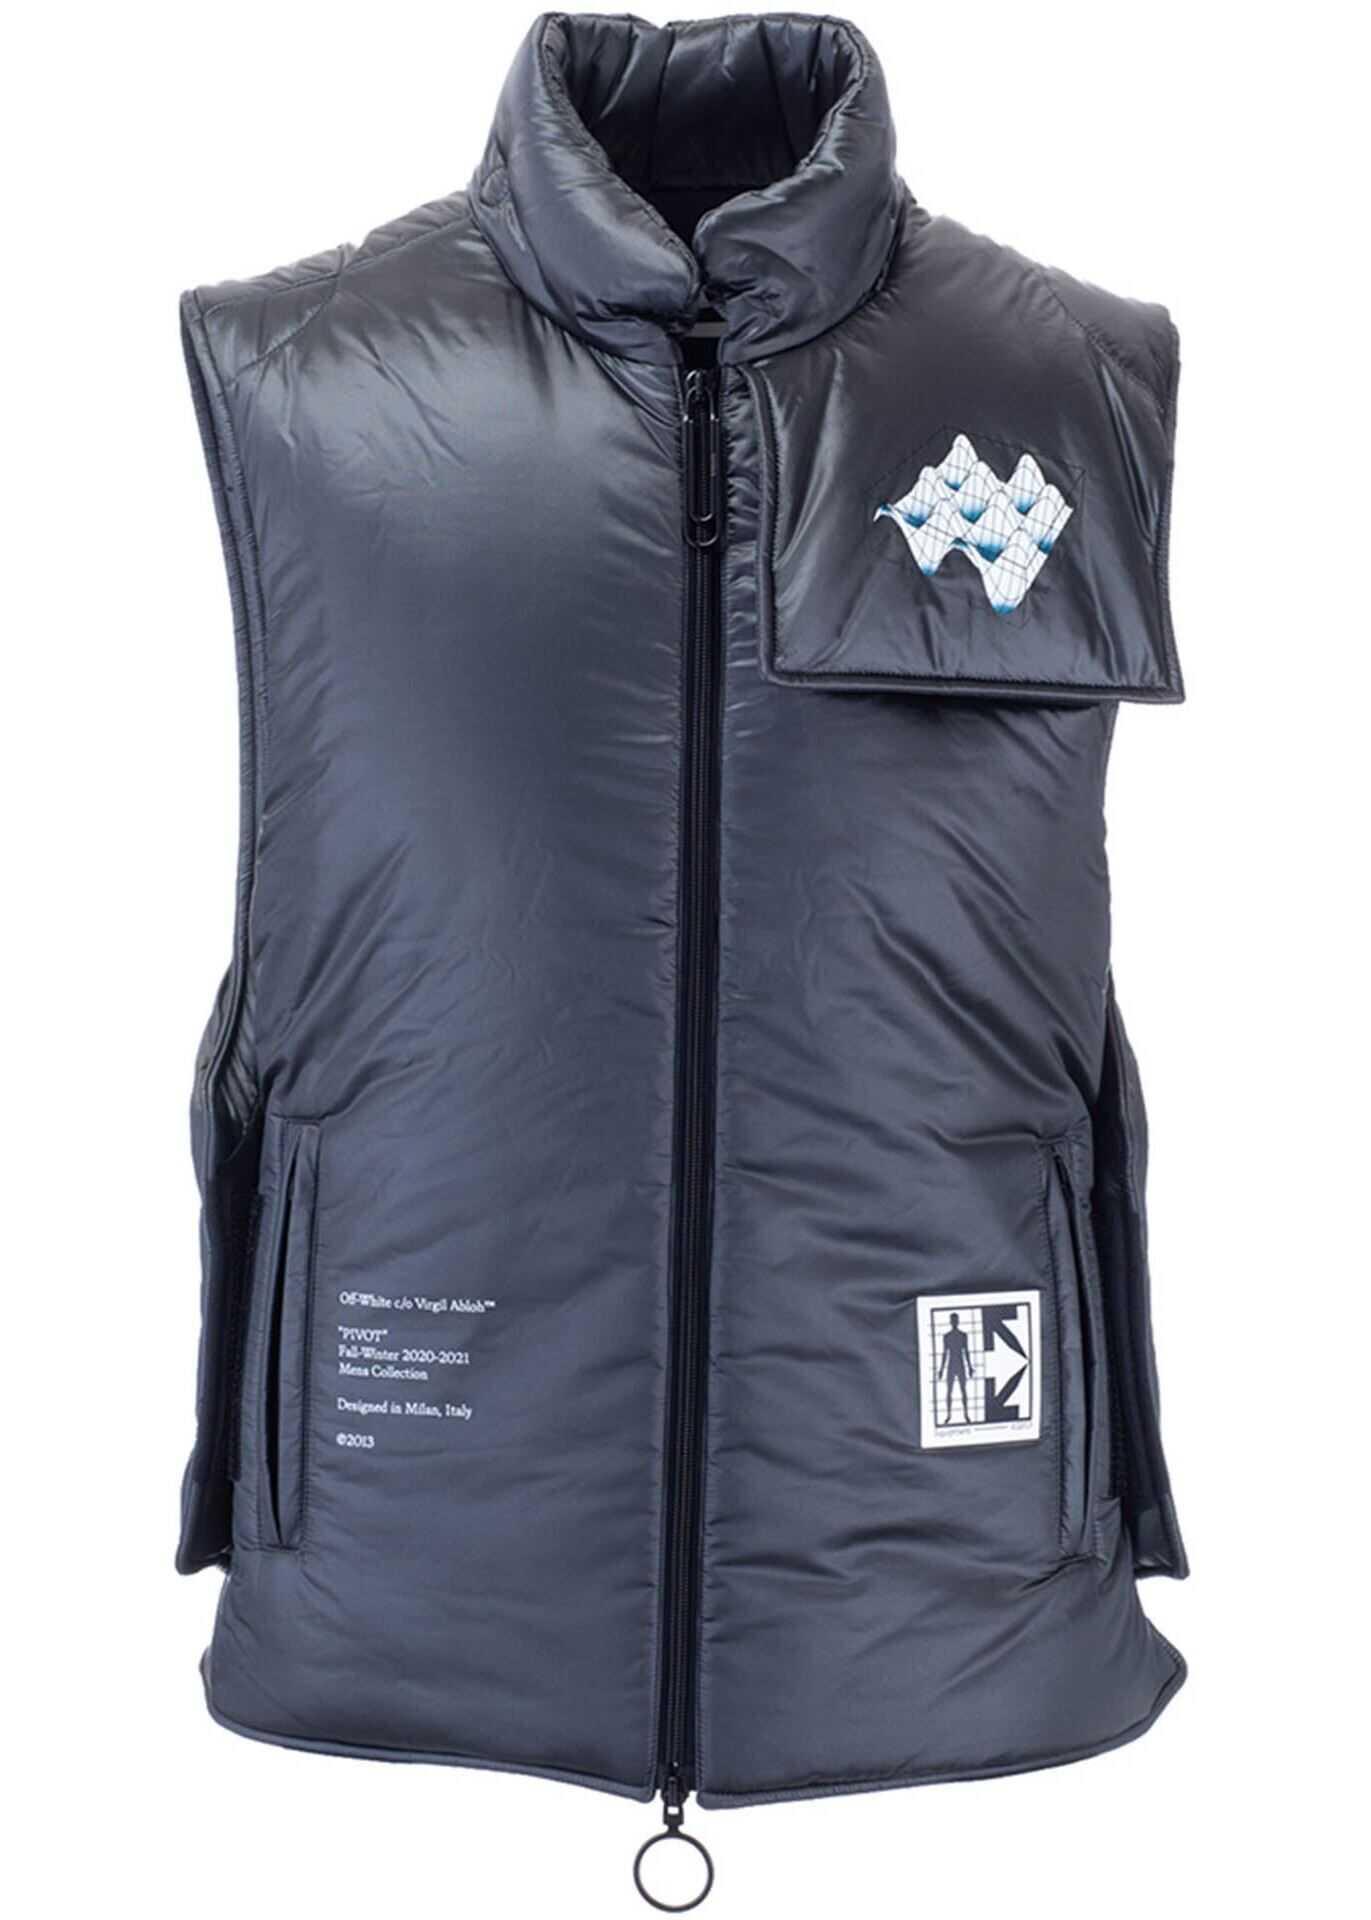 Off-White Arrows Padded Vest In Grey Grey imagine